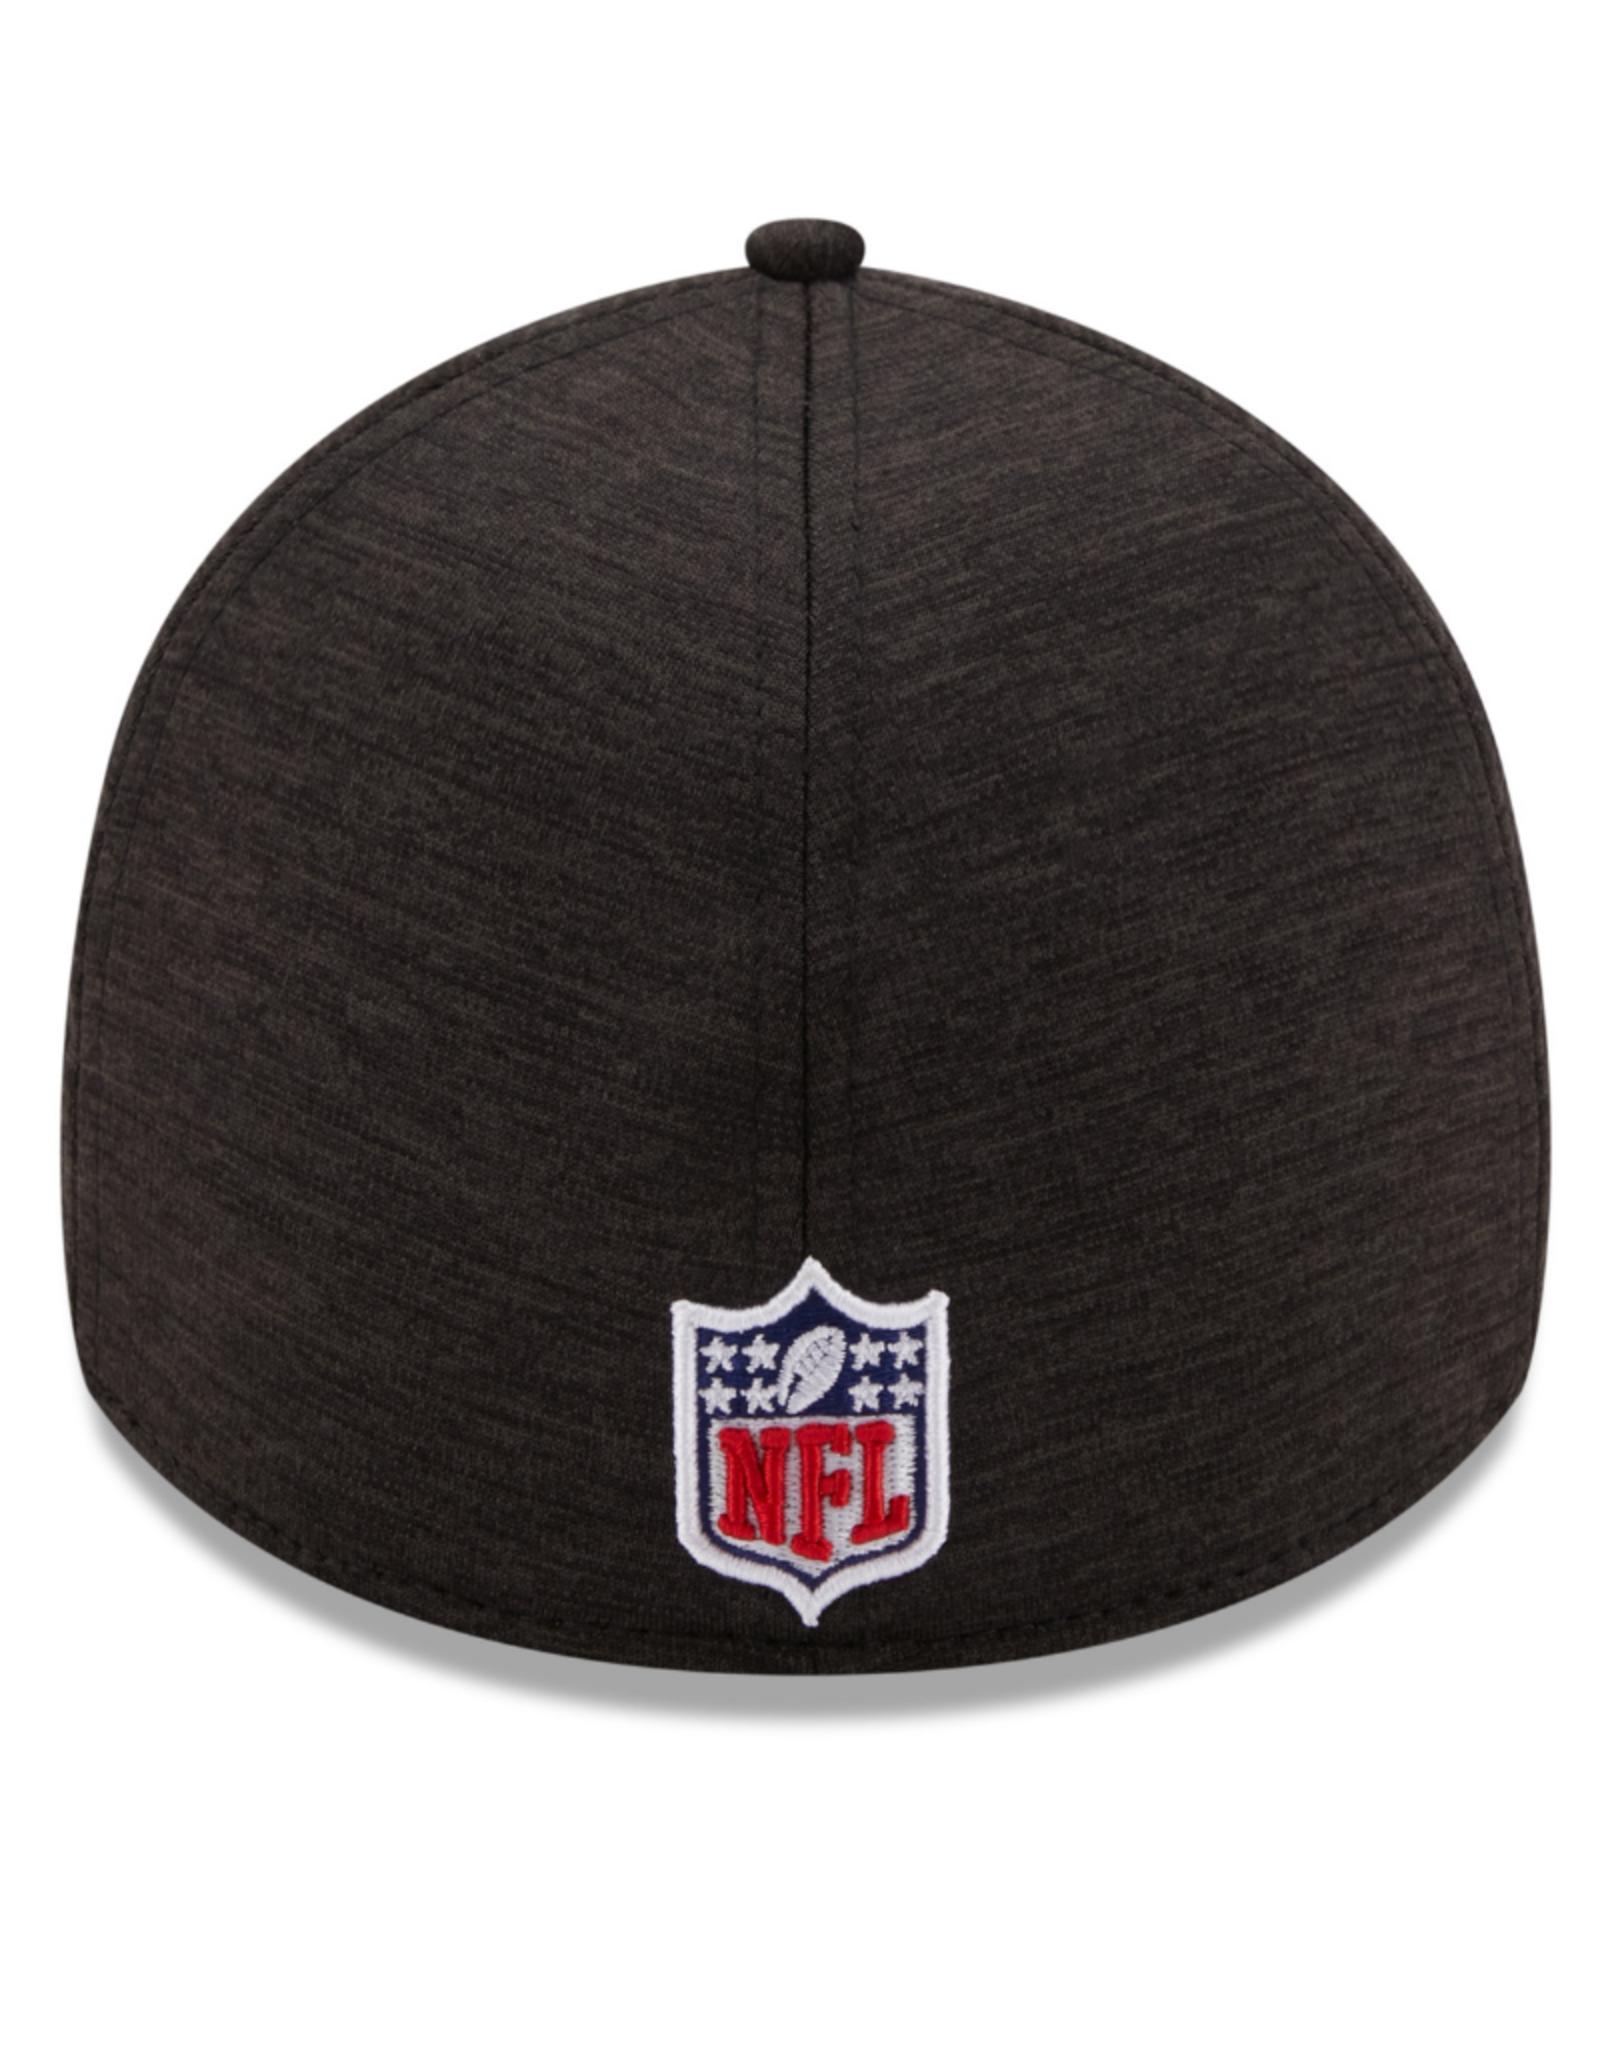 New Era Adult 39THIRTY Shadow B3 Hat Pittsburgh Steelers Black